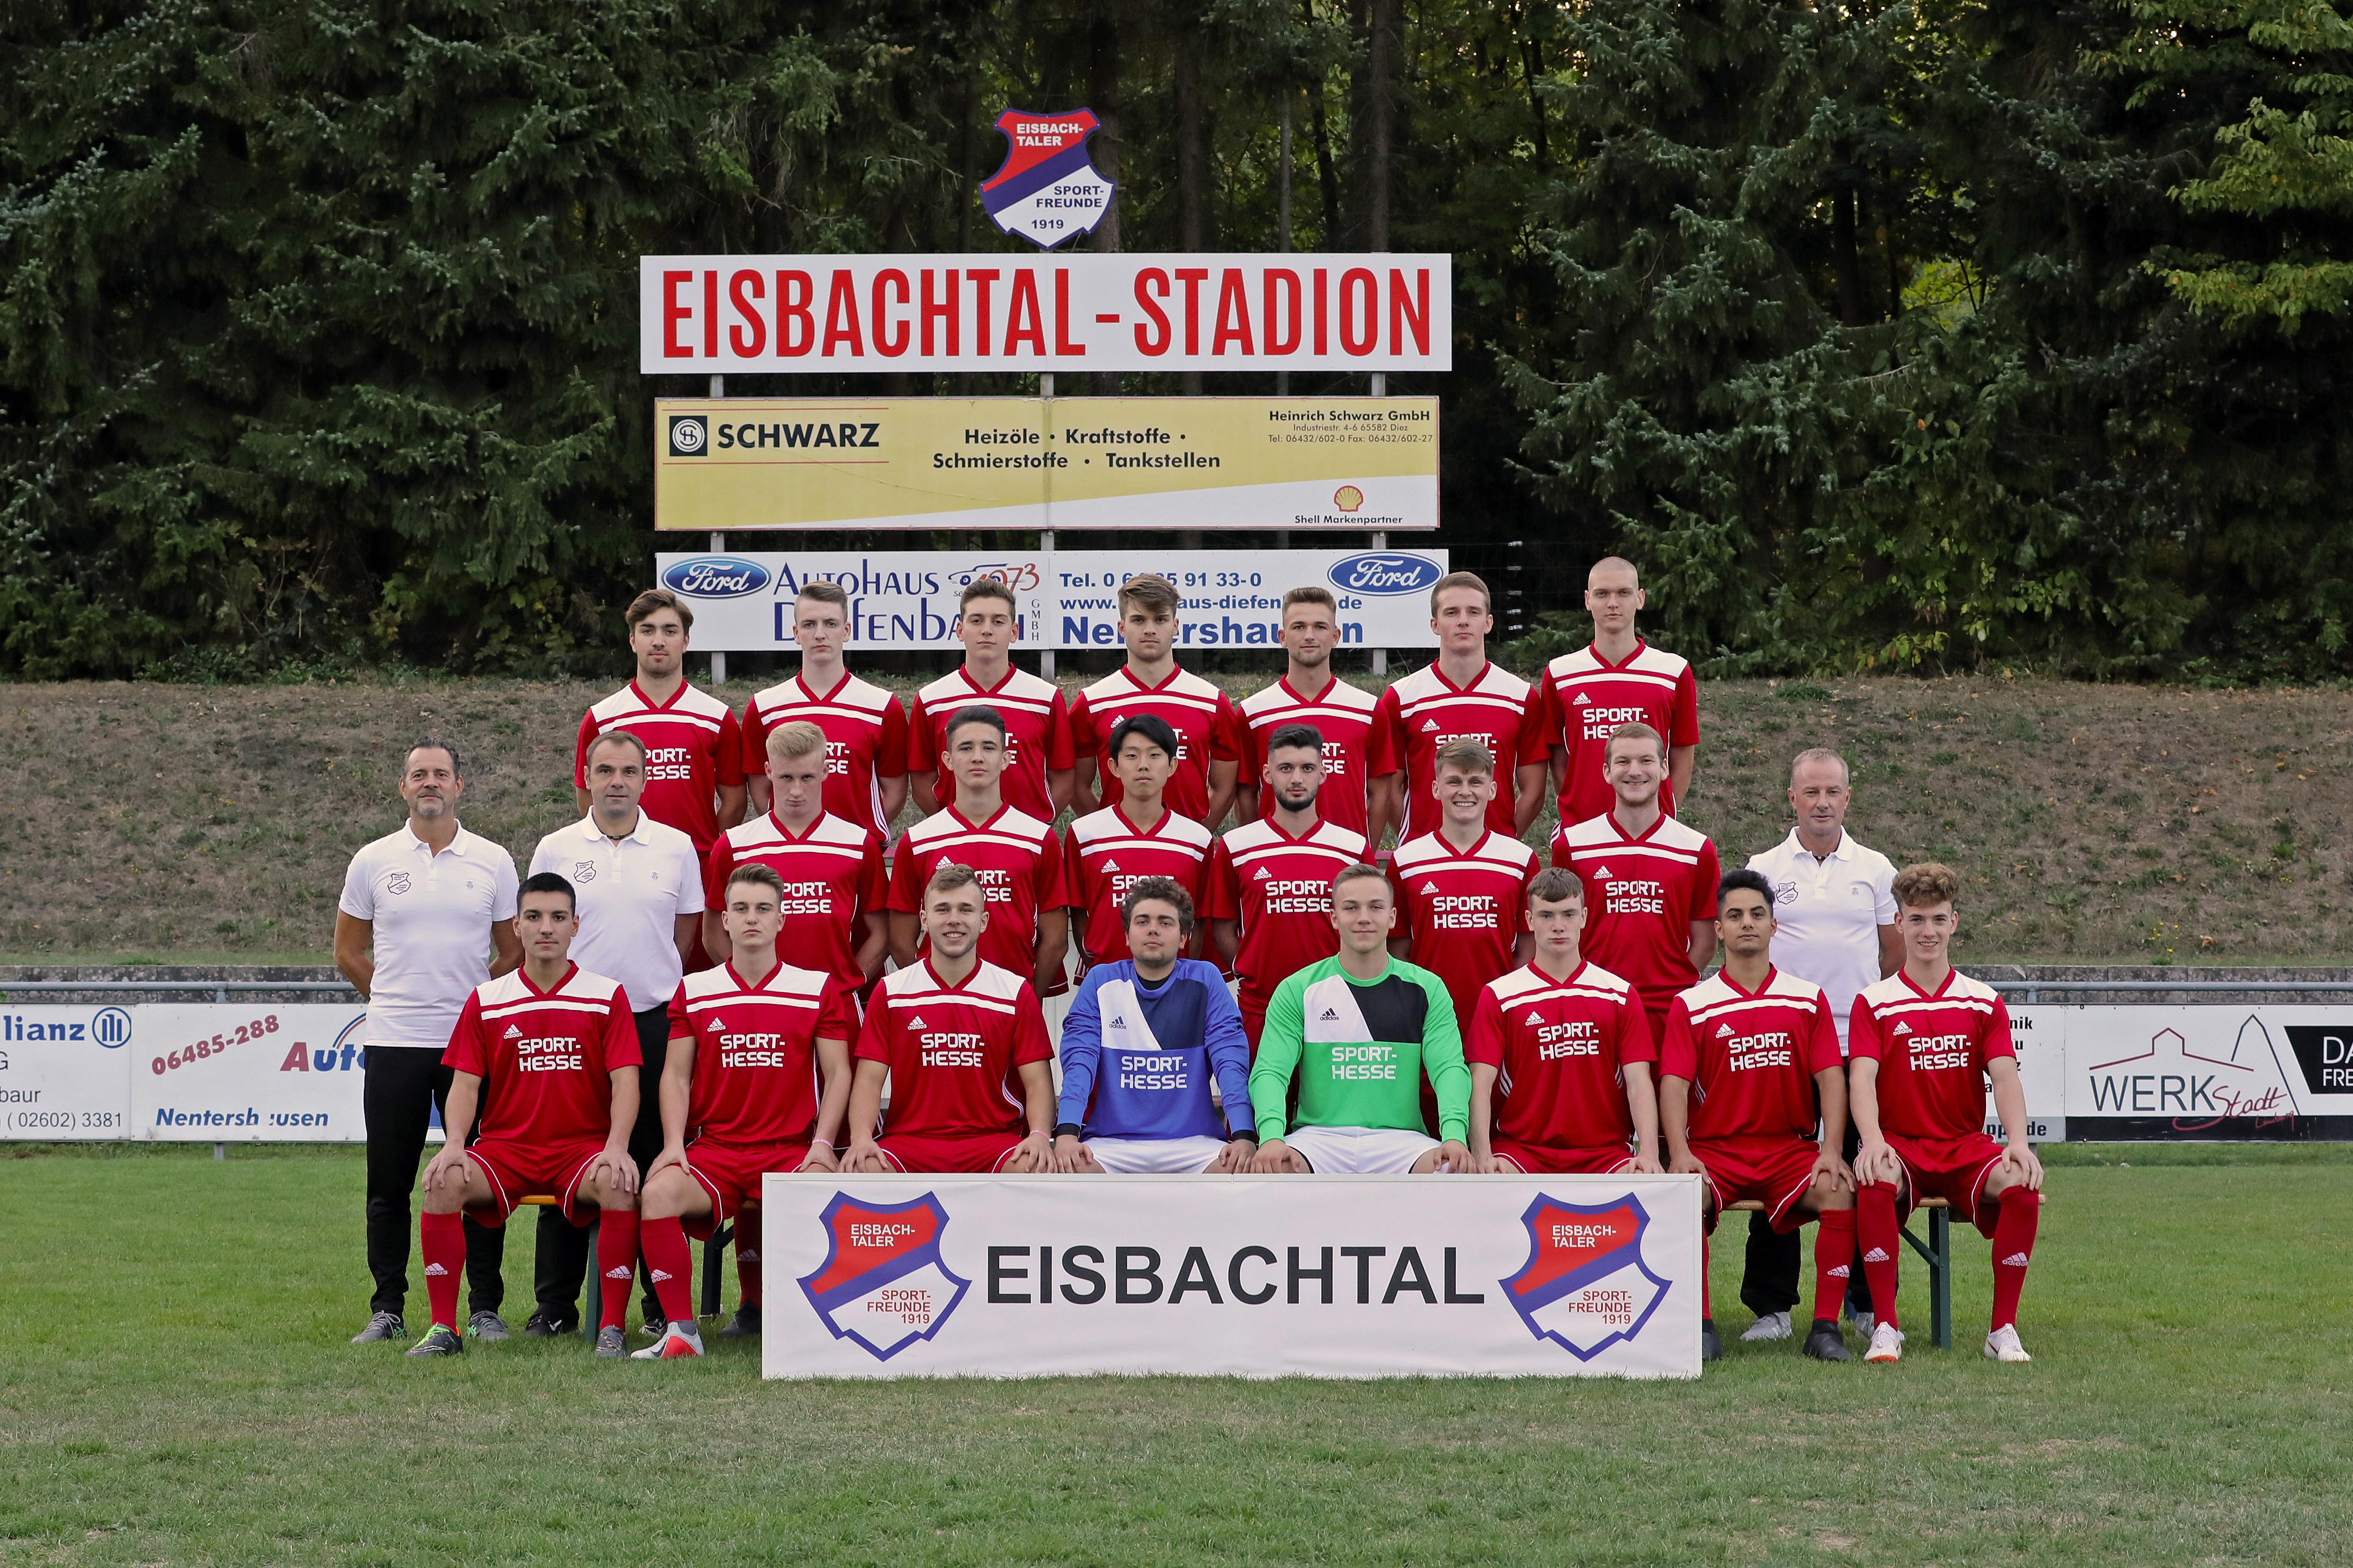 Sportfreunde-Eisbachtal, A1-Jugend (U19) Regionalliga Südwest Saison 2016/2017